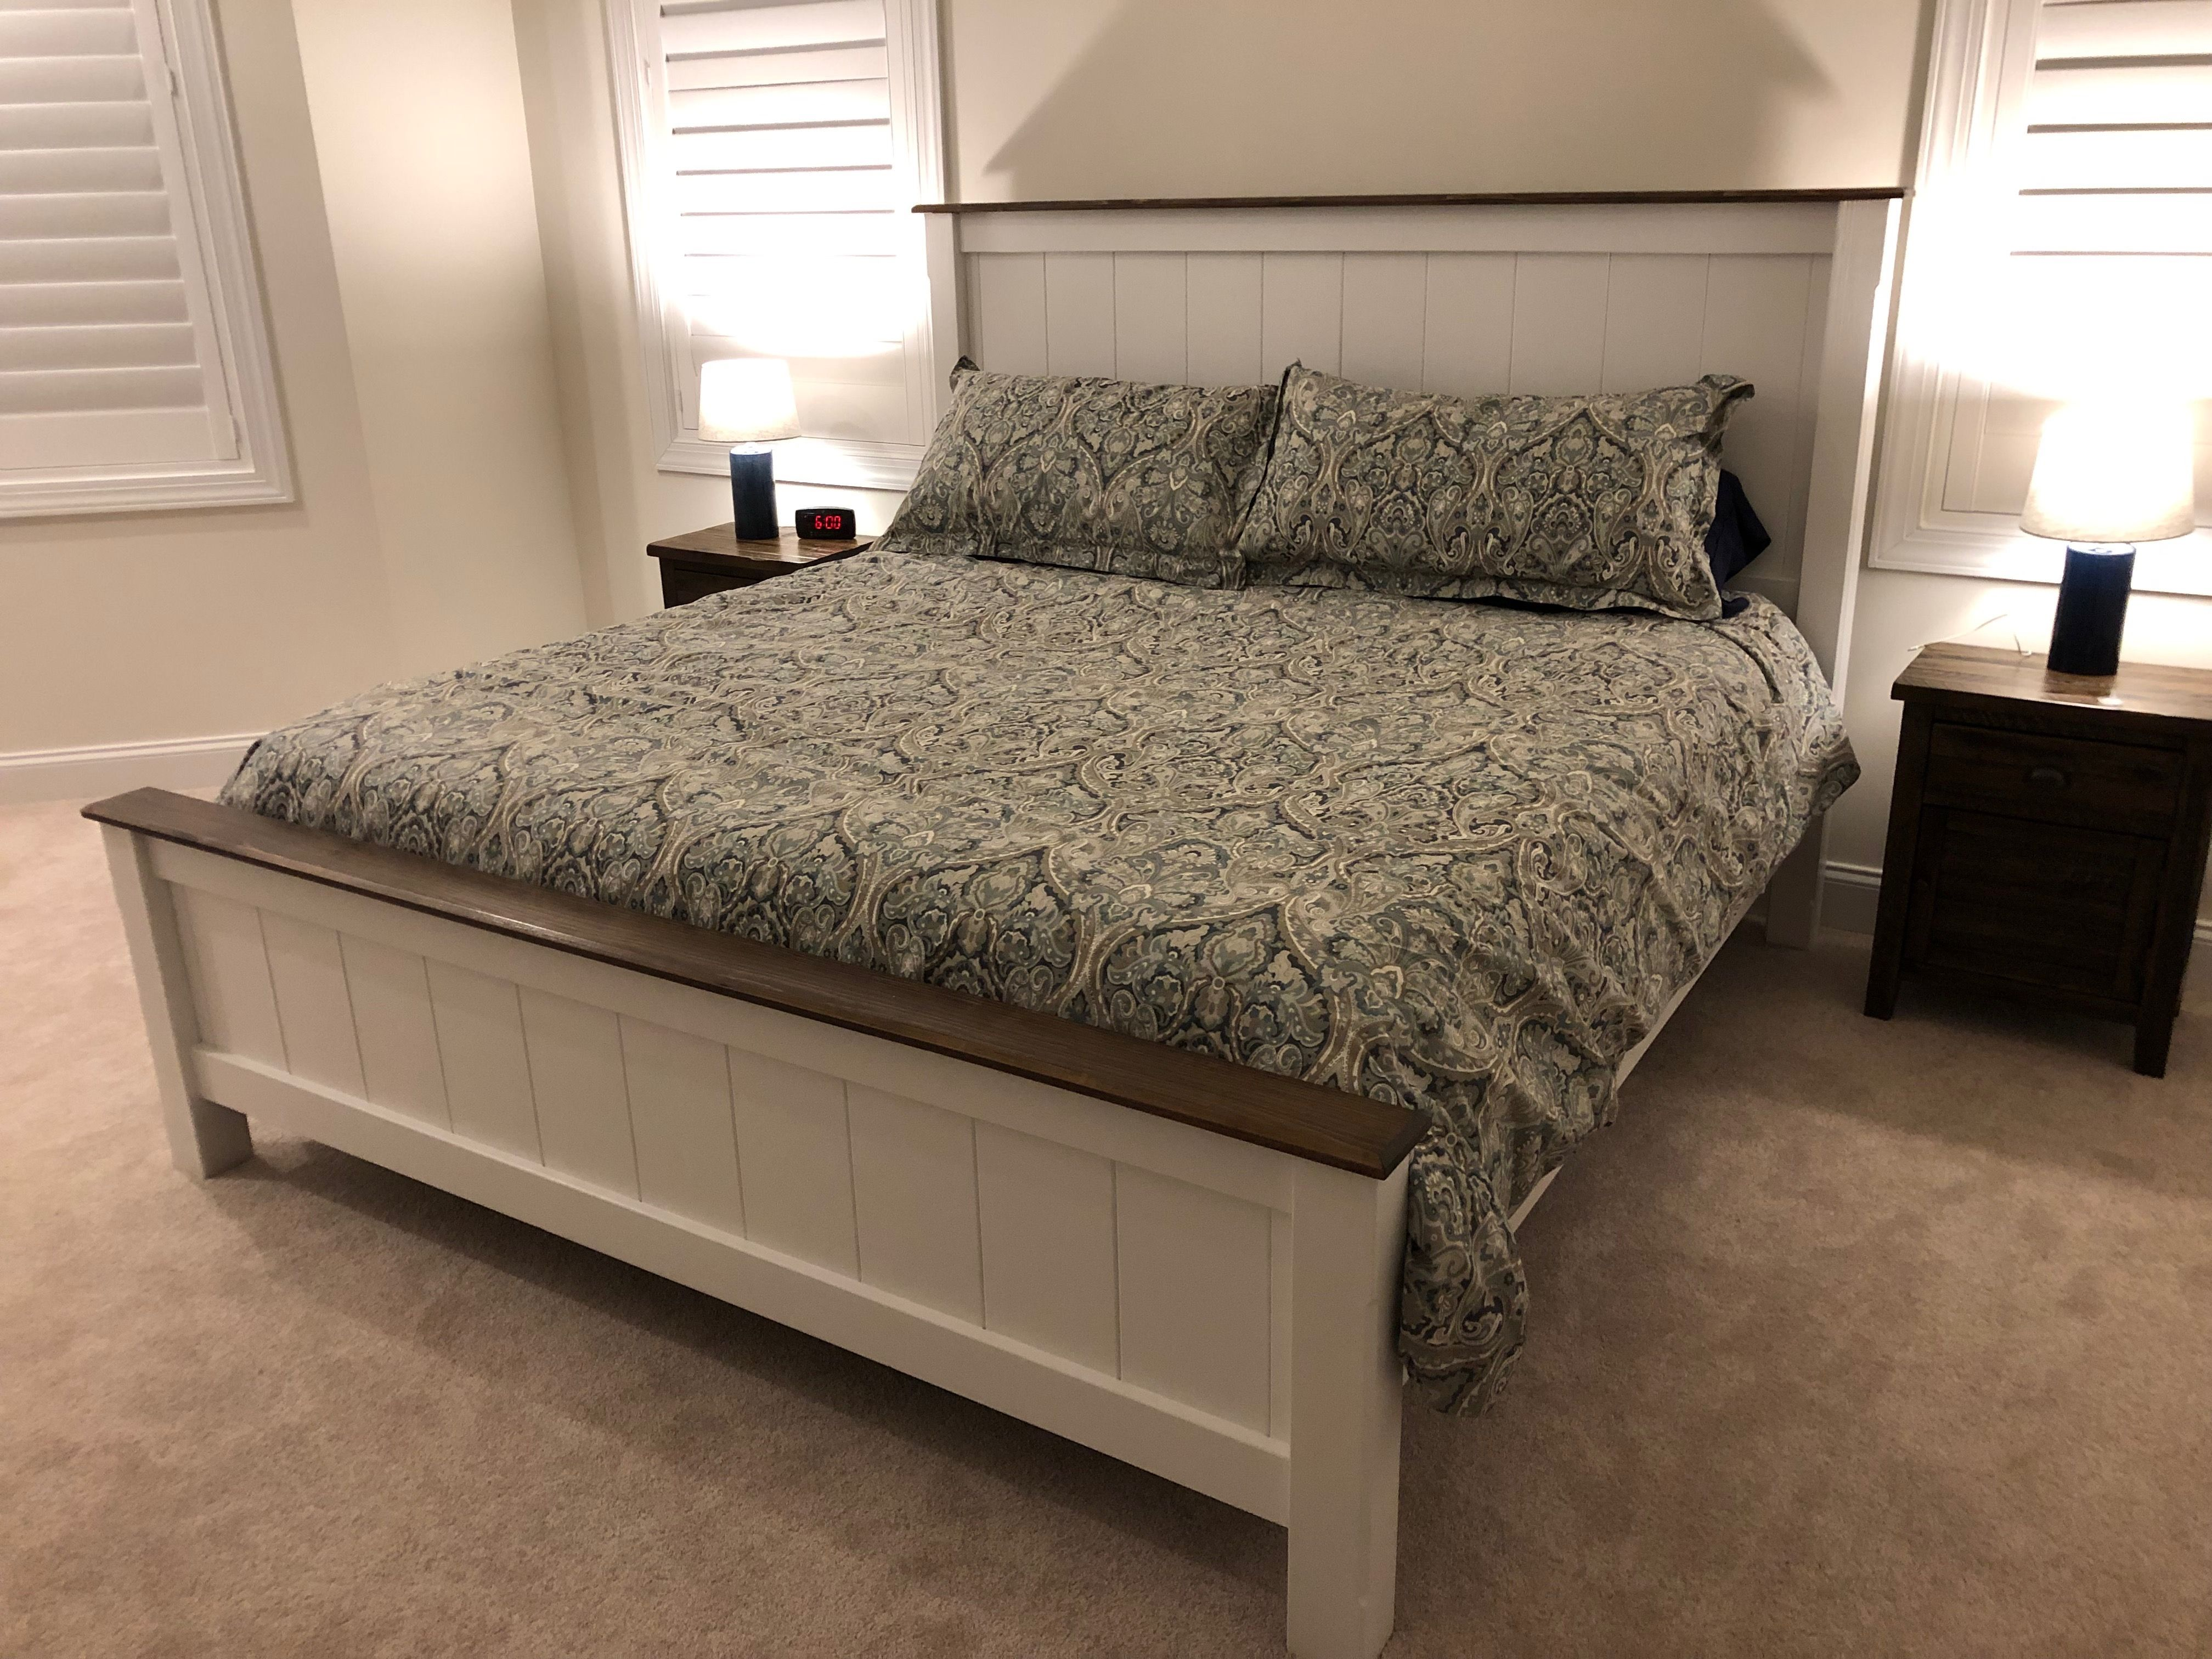 Ana White   King Farmhouse Bed   DIY Projects   Farmhouse ...